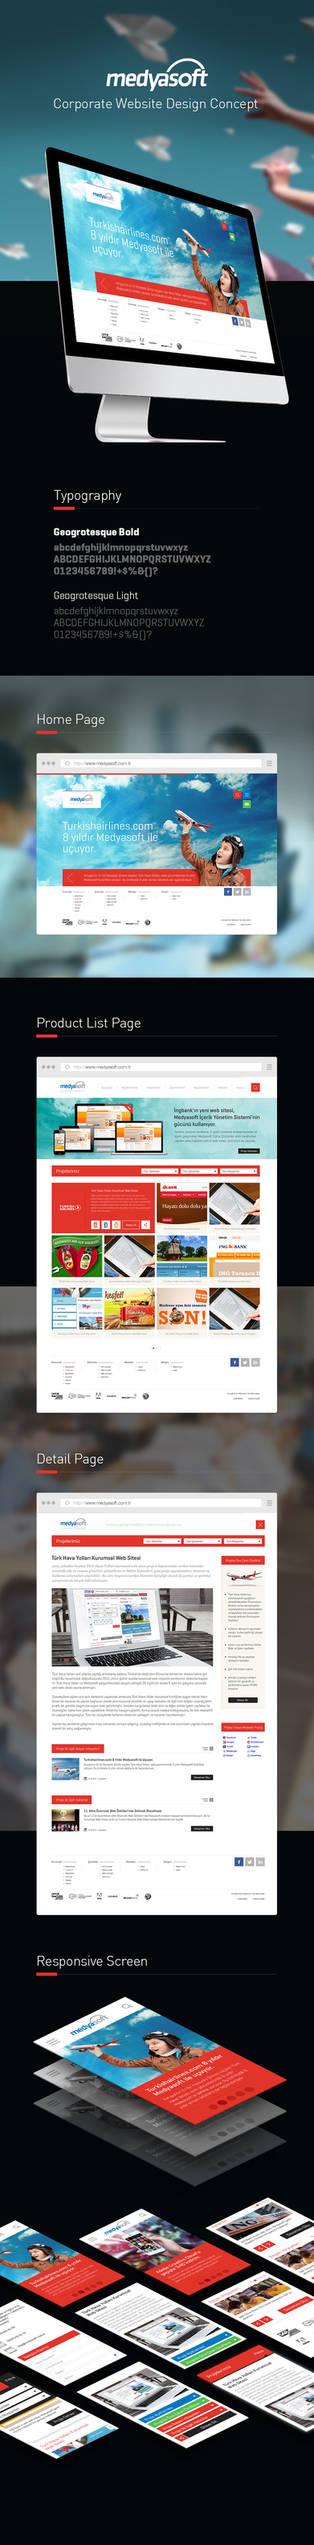 Medyasoft Web Design - Casestudy